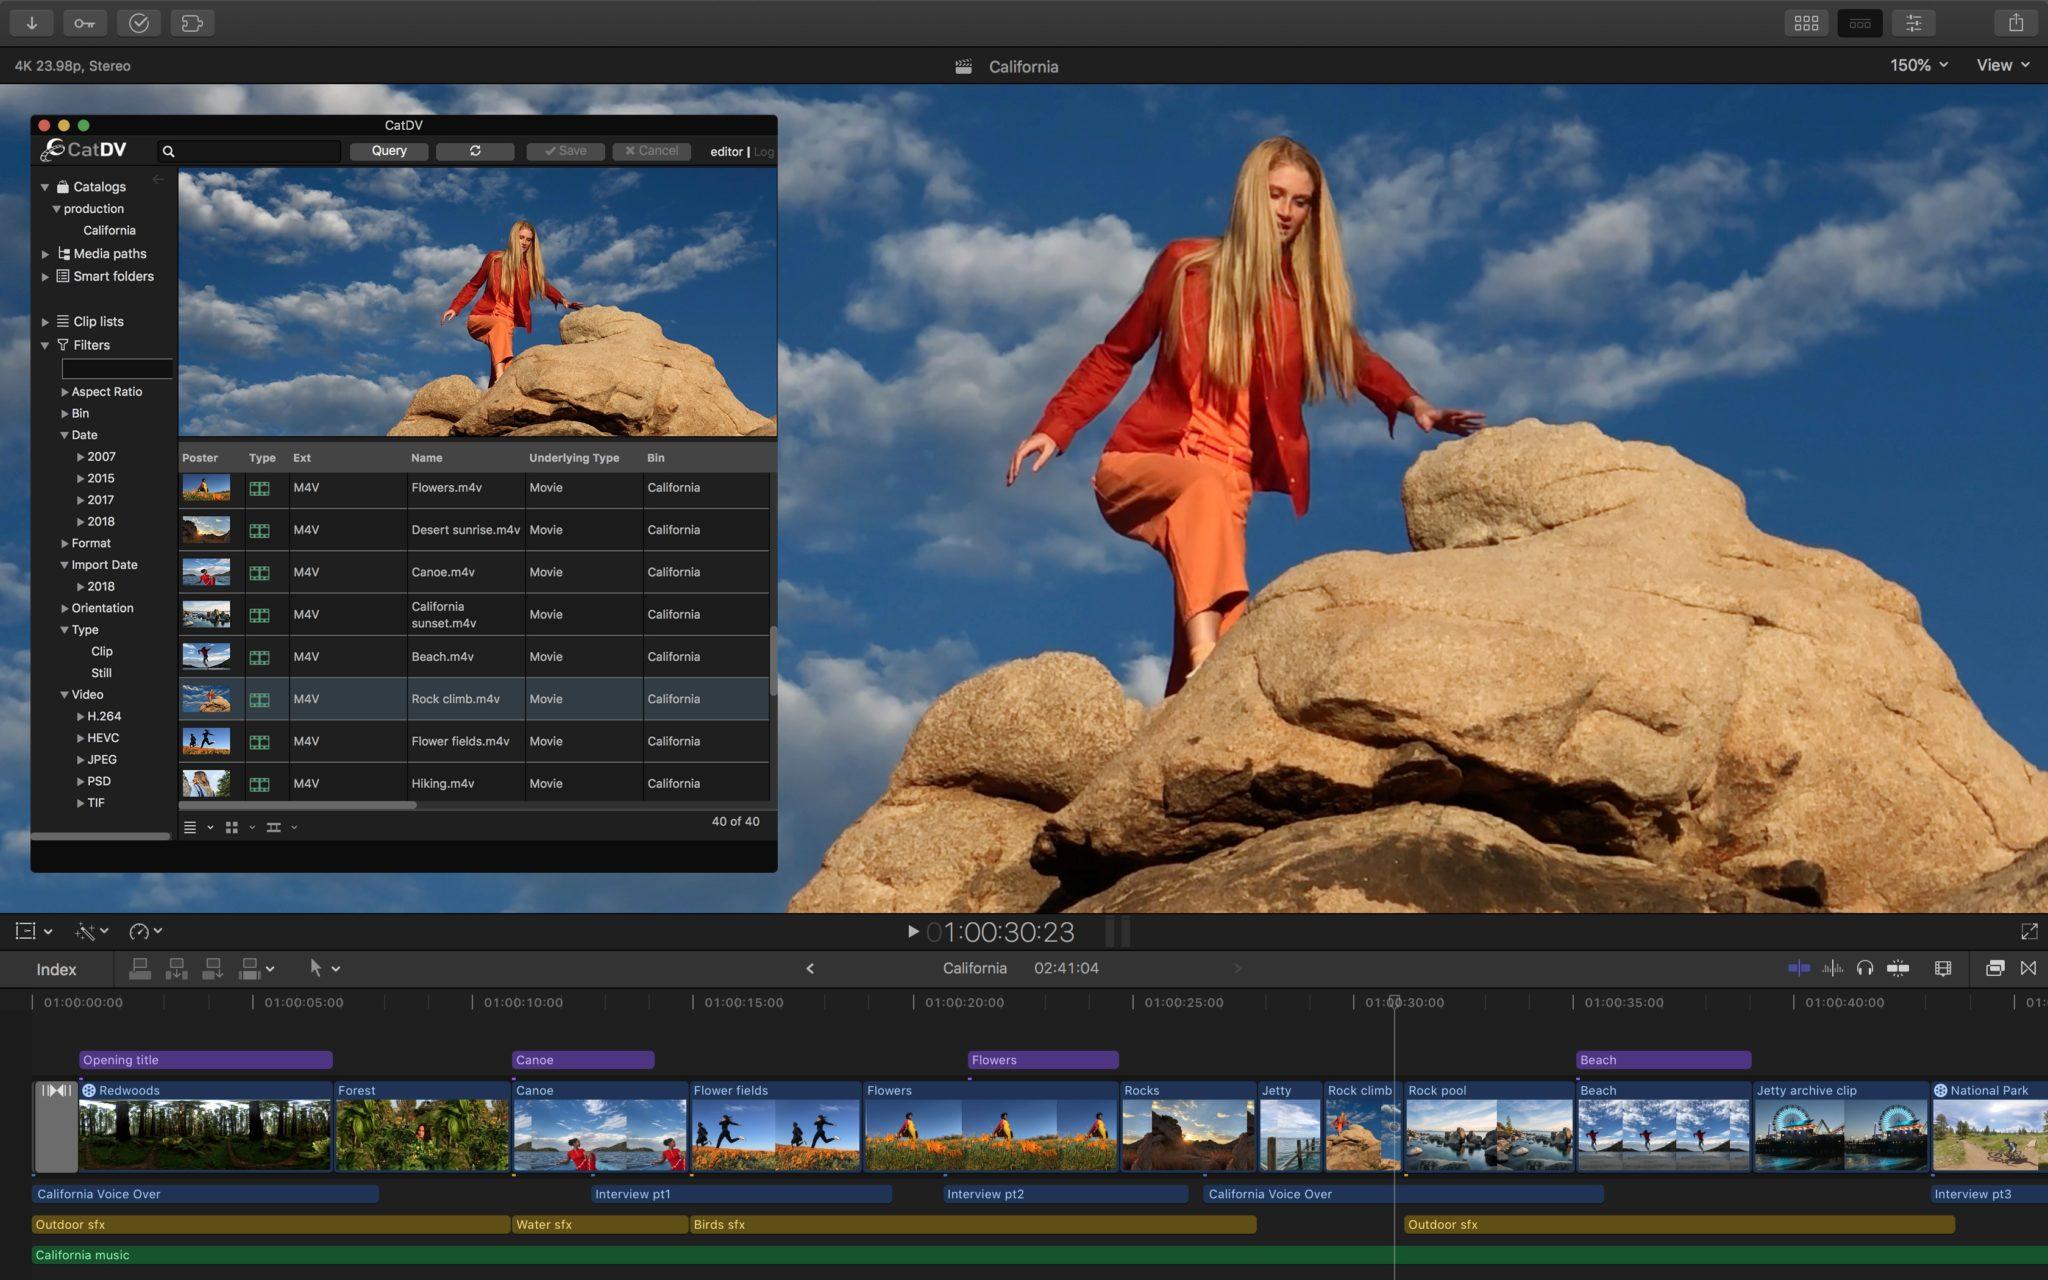 Final Cut Pro X workflow extensions CatDV 11152018 - Final Cut Pro X prináša podporu pre rozšírenia tretích strán